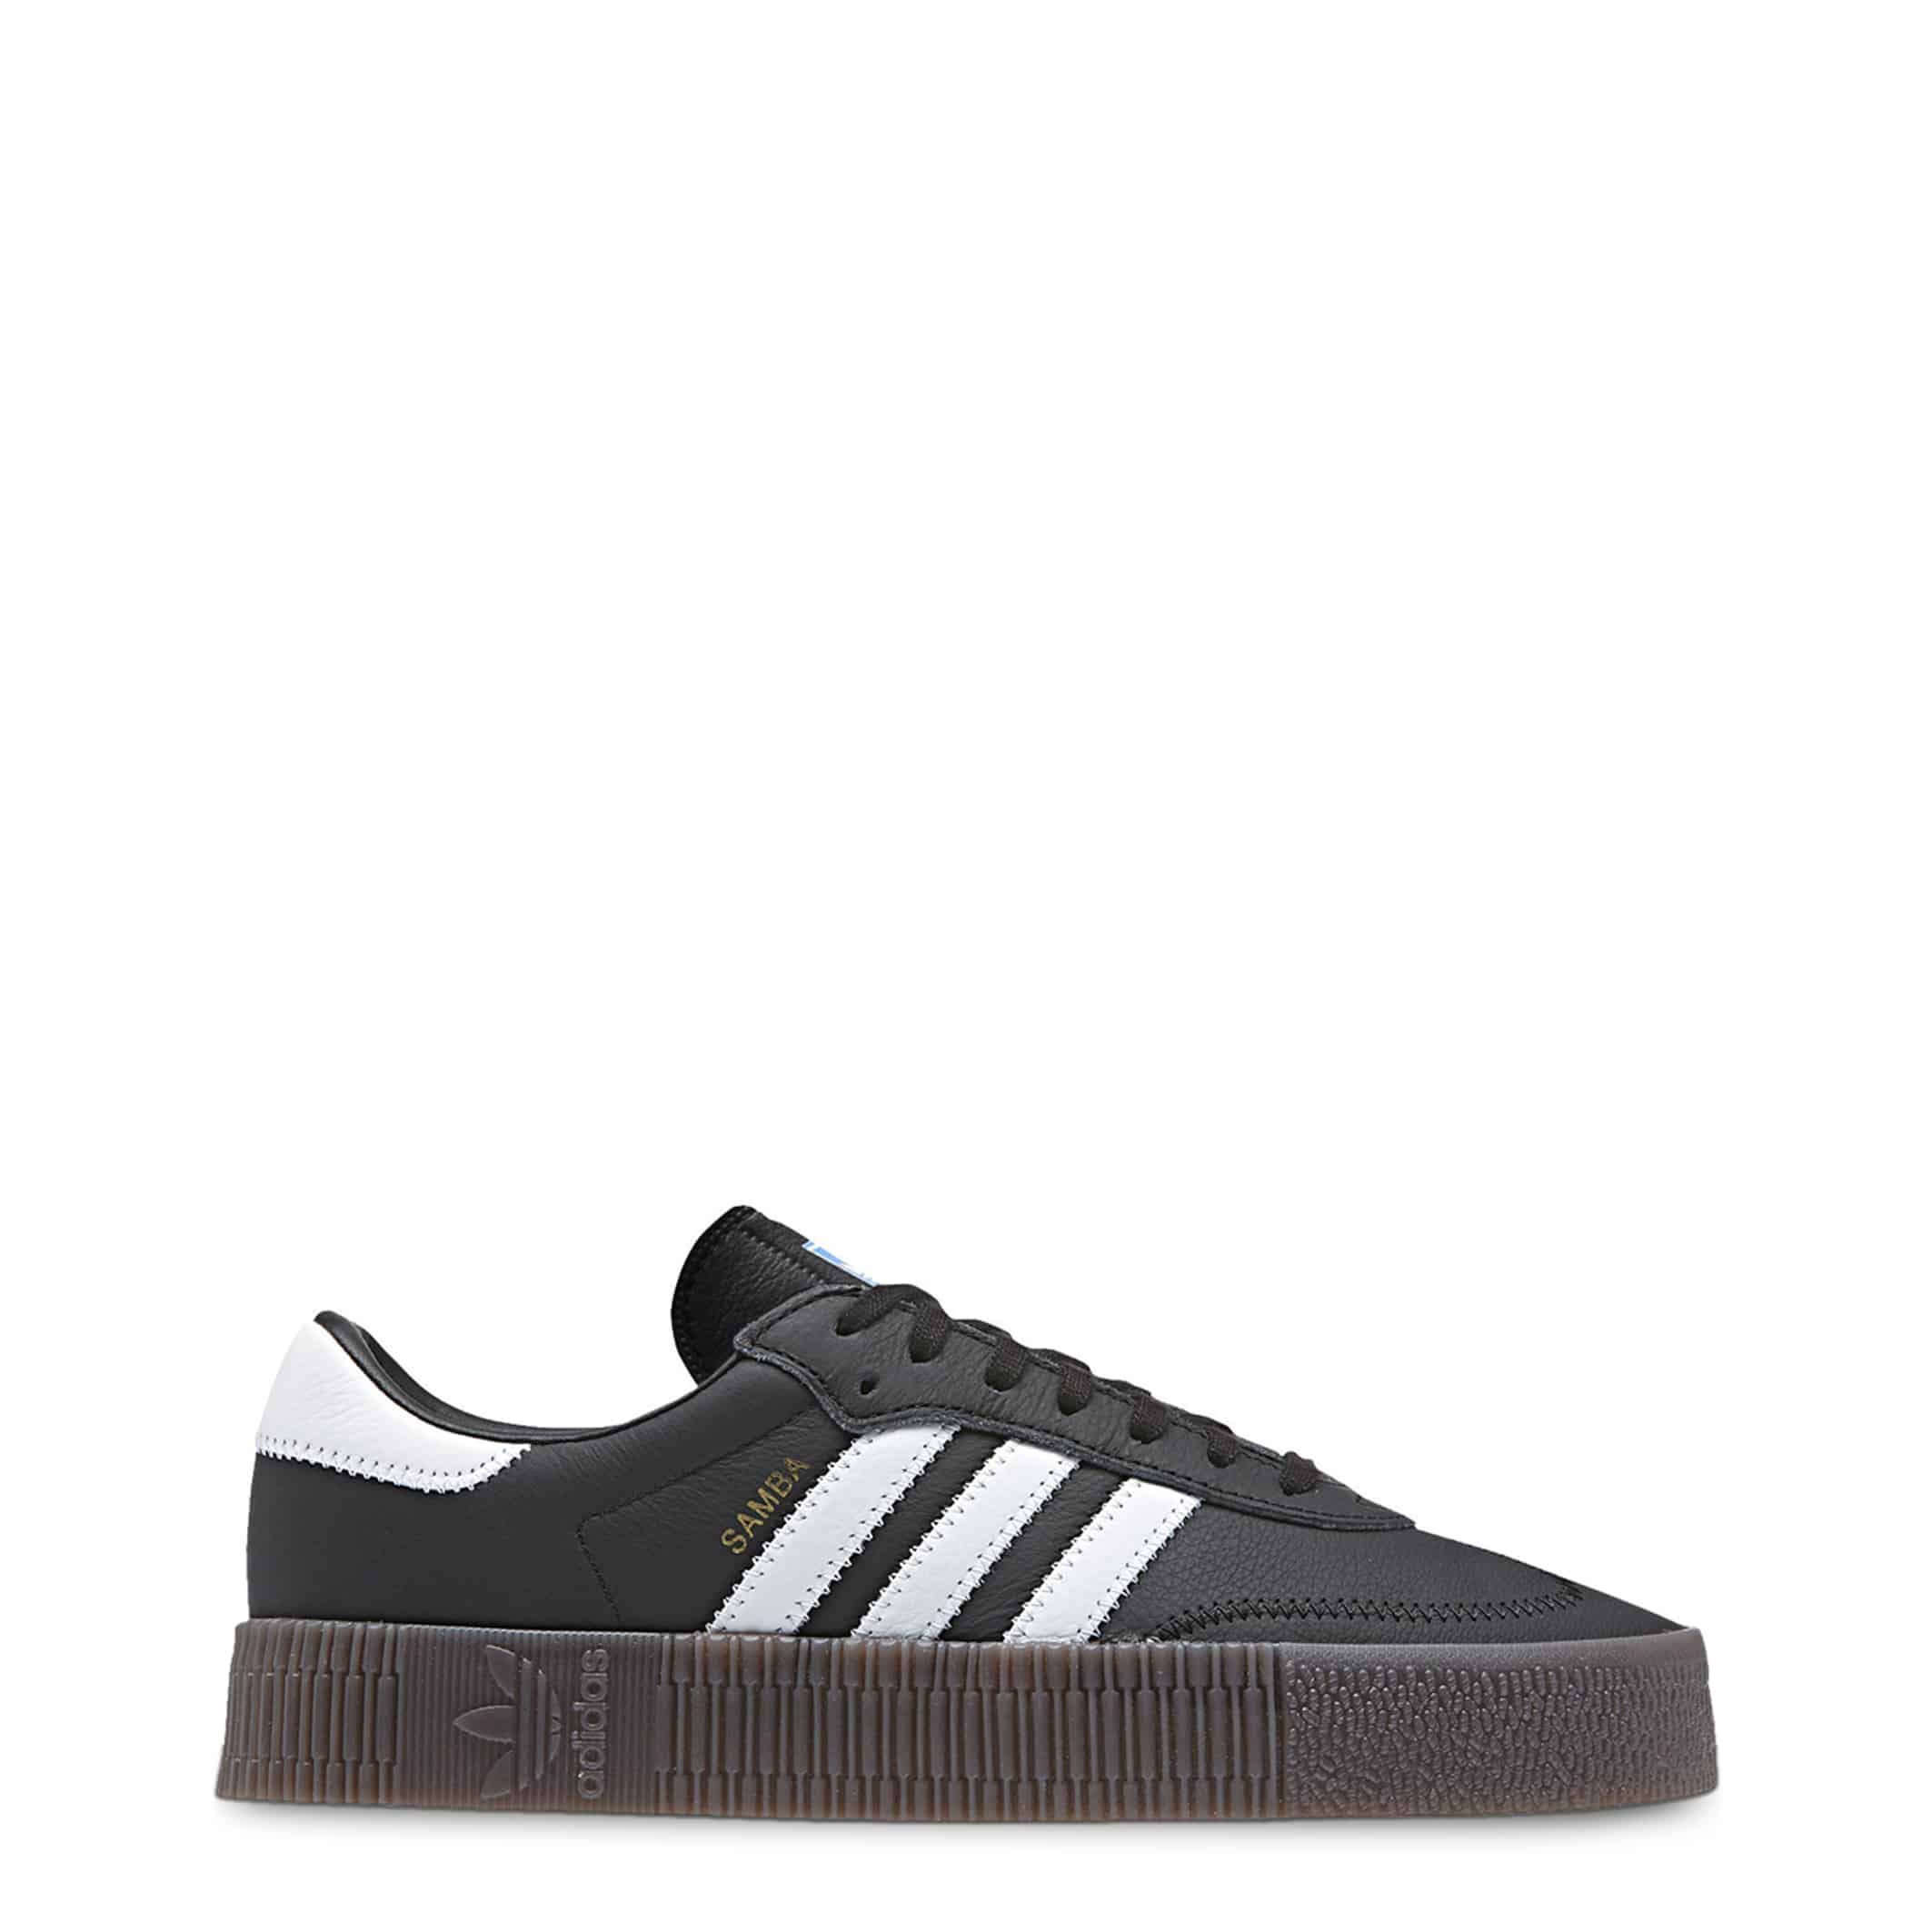 Adidas - Sambarose | You Fashion Outlet